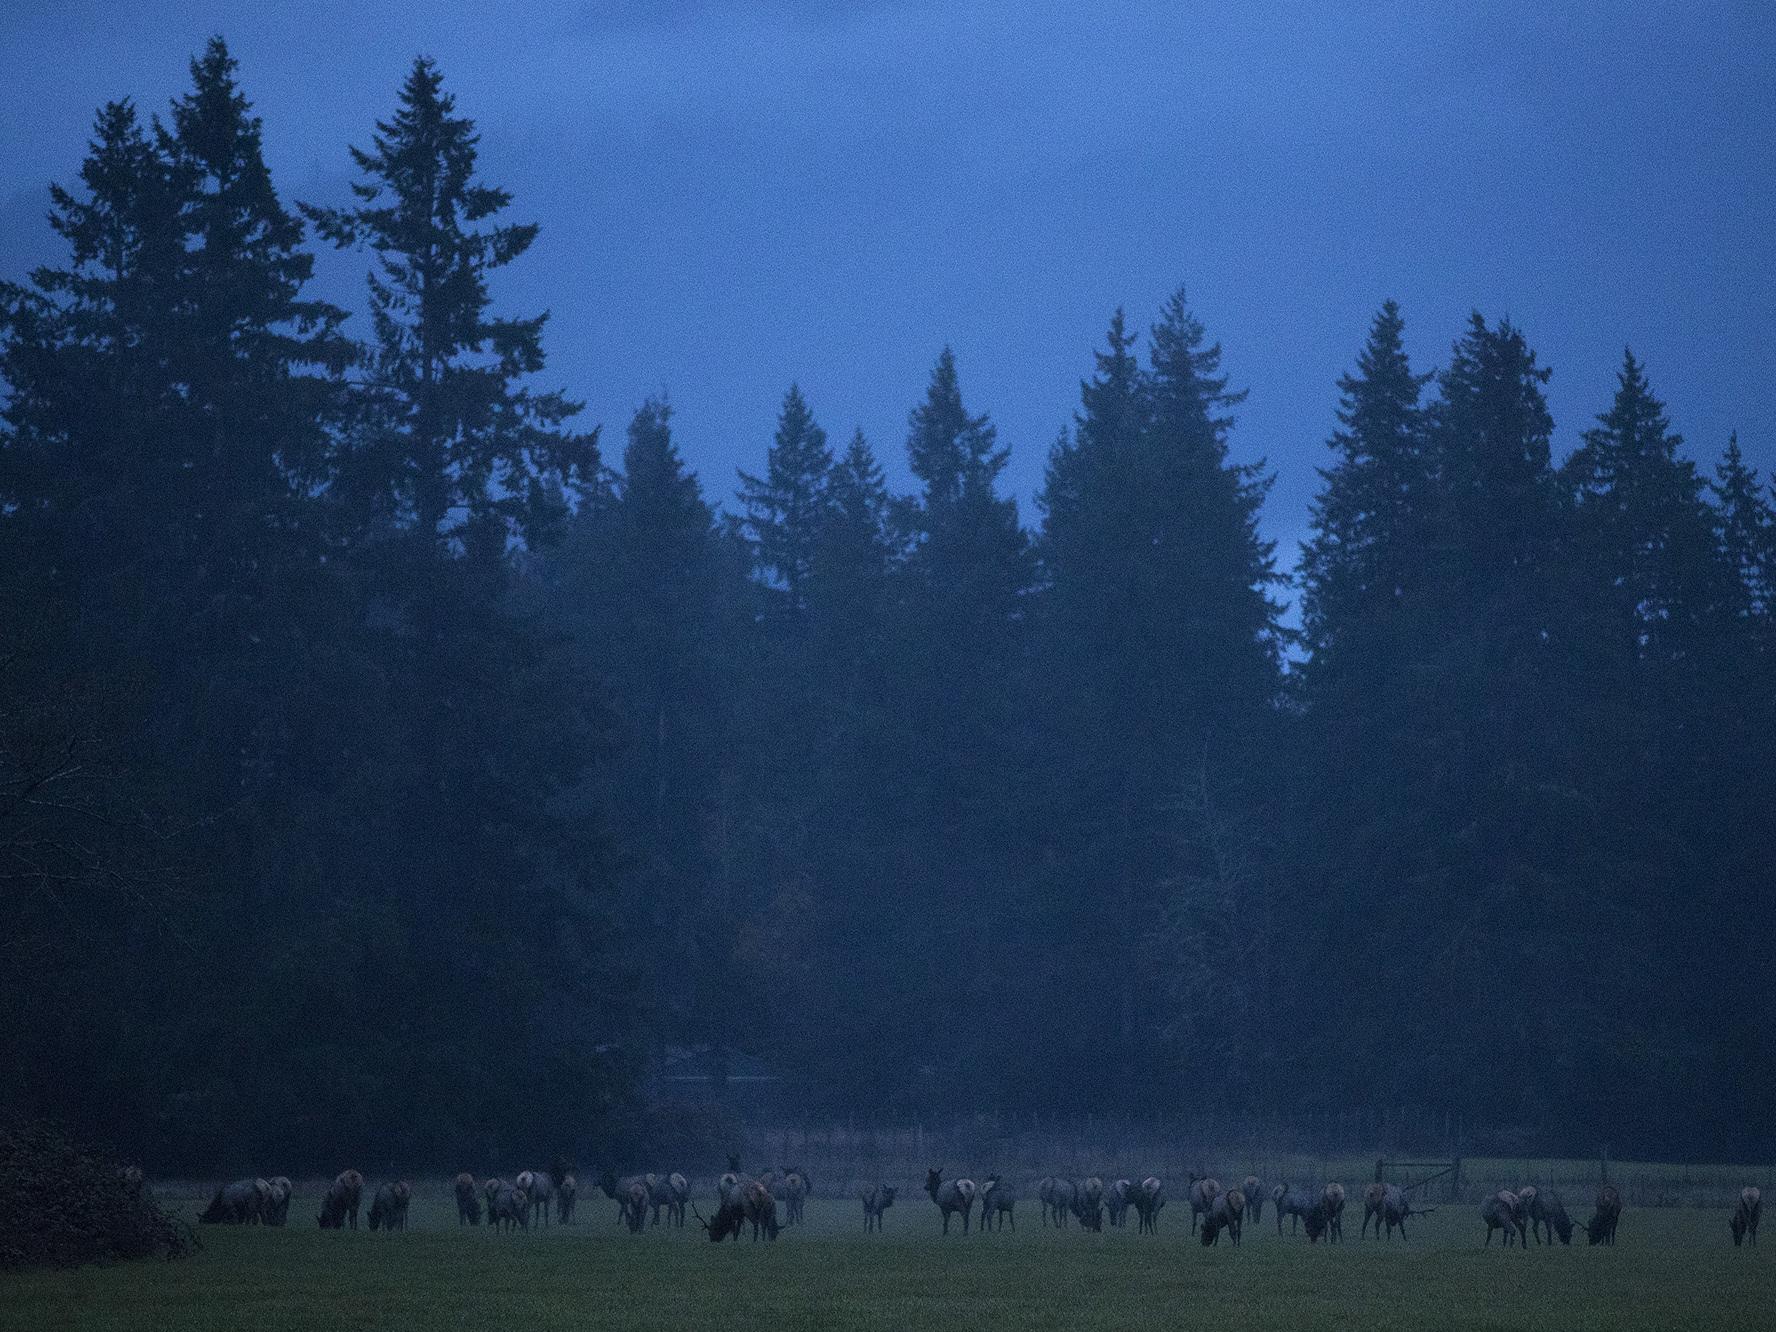 Elk Raise Tensions Between Tribes And Farmers In Washington's Skagit Valley